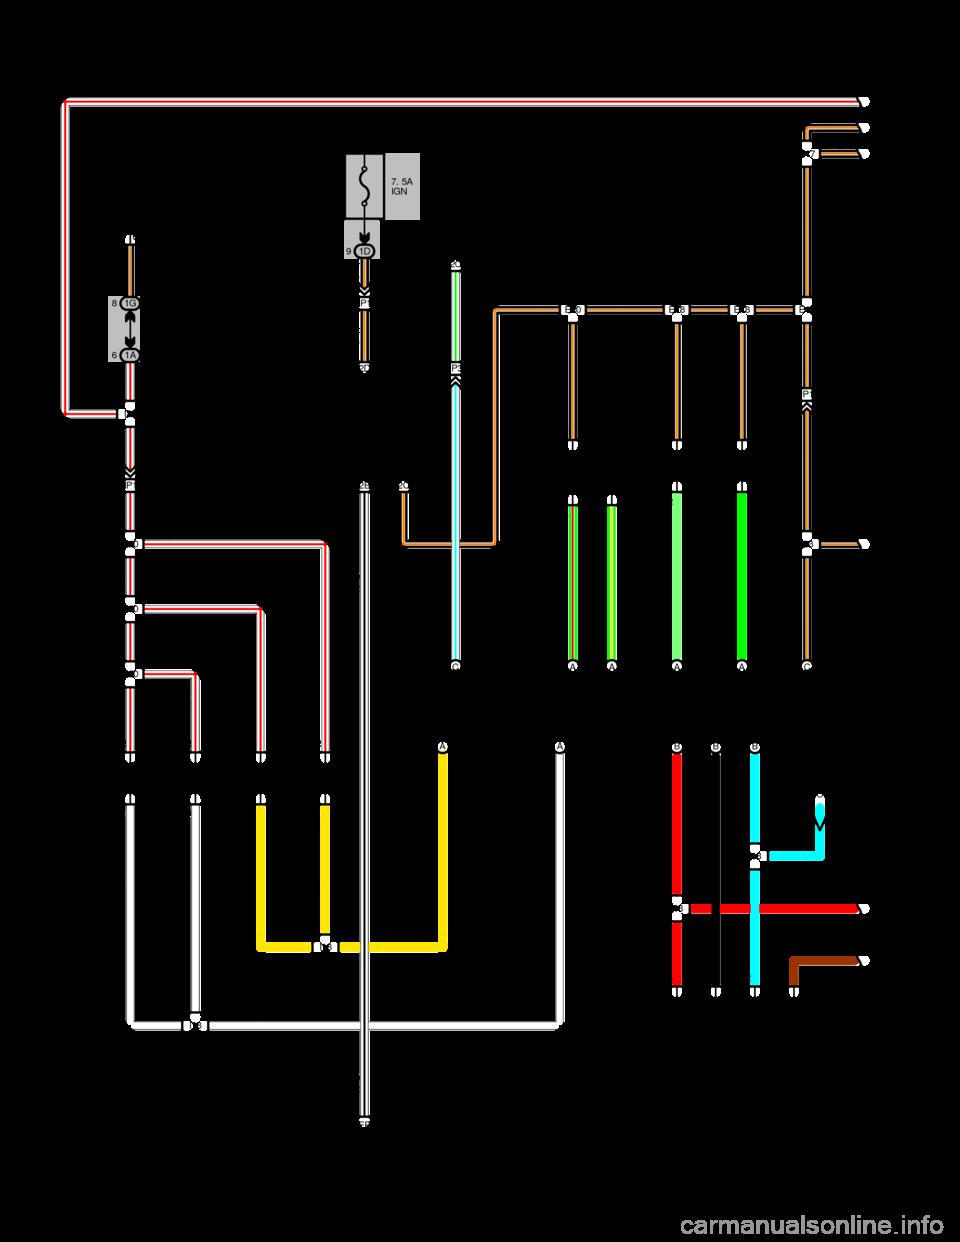 medium resolution of 98 camry engine compartment diagram wiring diagram sheet98 camry engine compartment diagram wiring library 98 camry